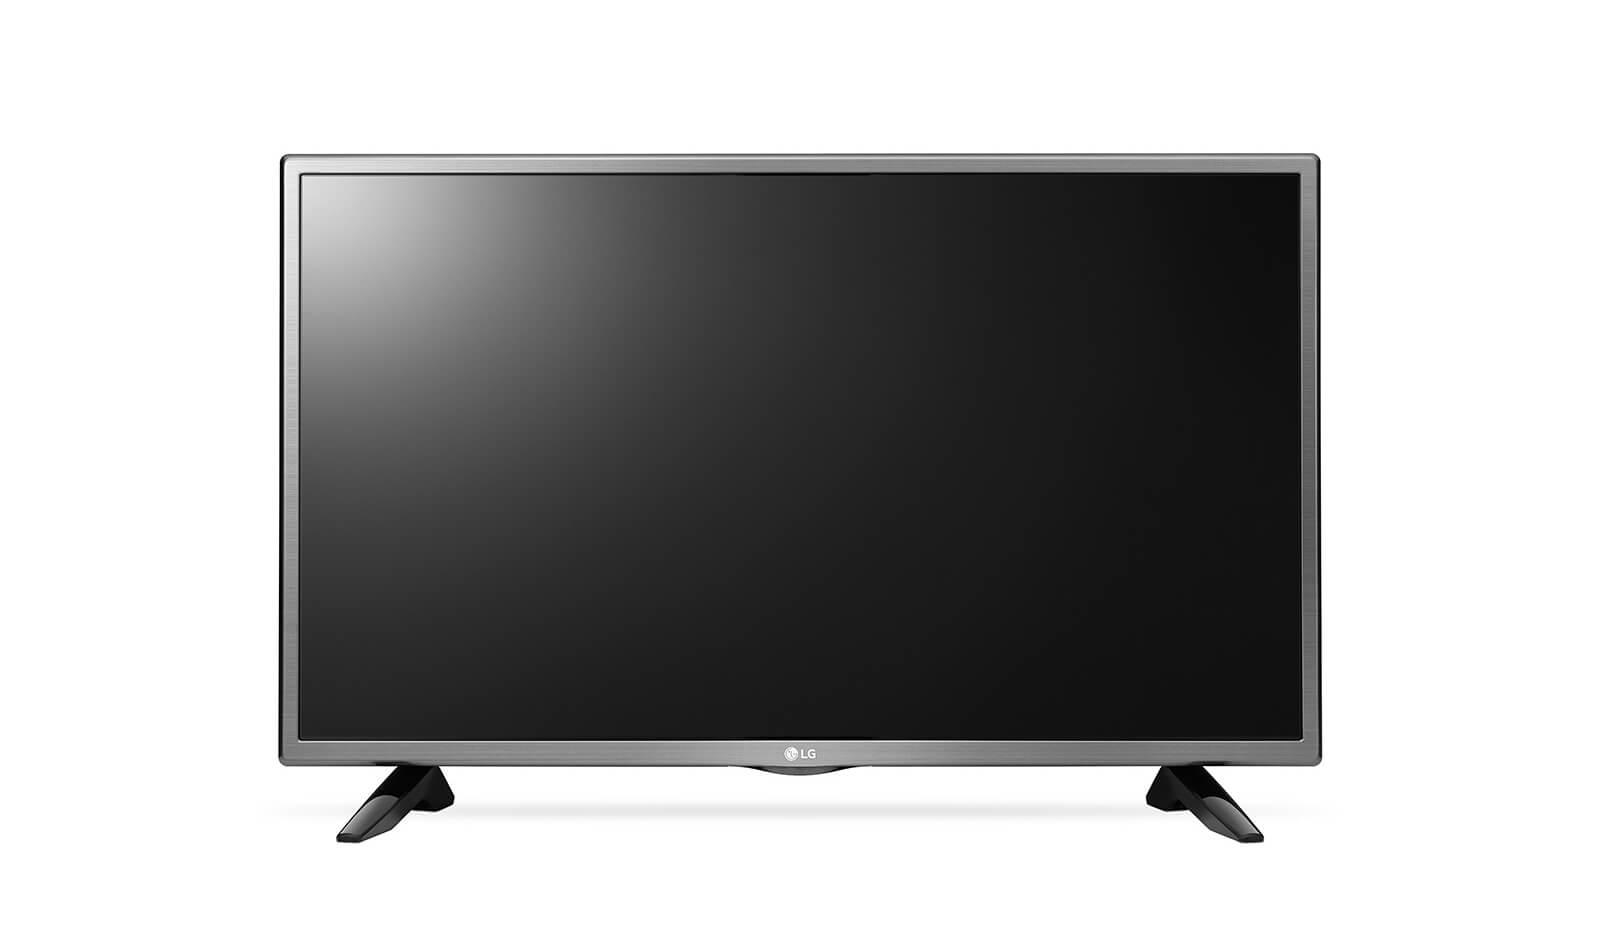 LG 32 inch HD Ready TV 32LJ573D